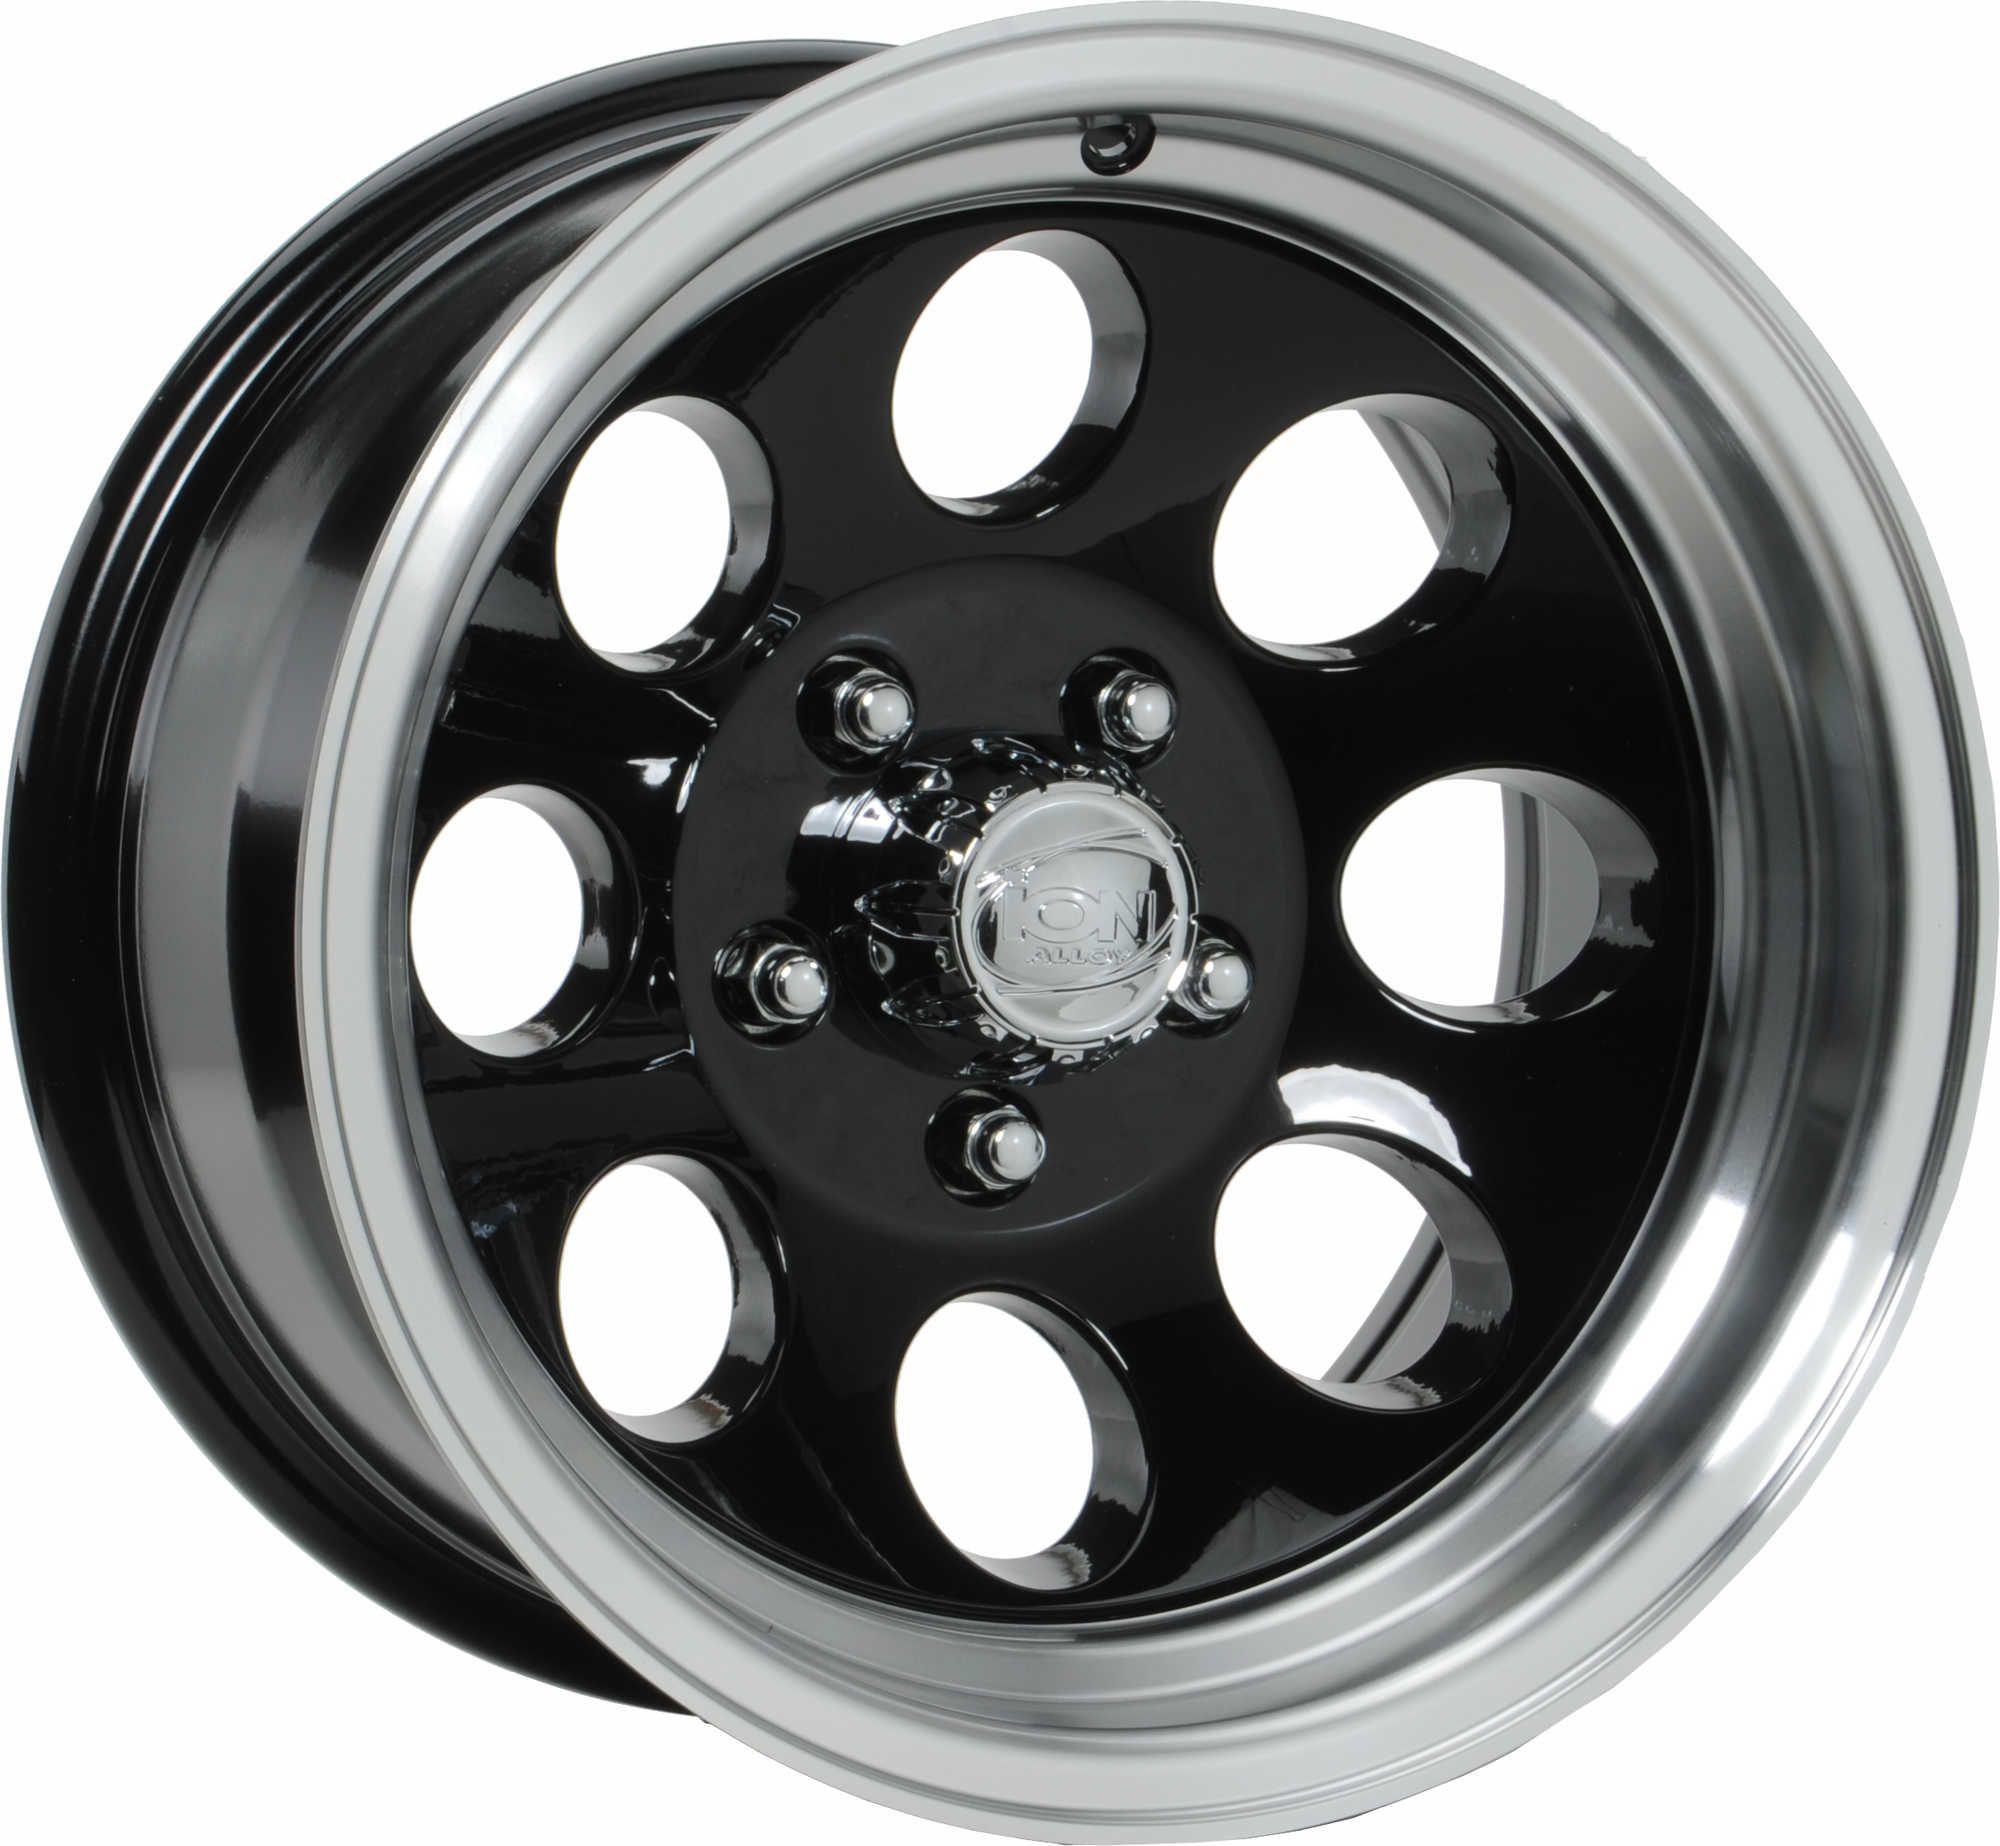 iON Alloy Wheels brilliant design team are creating the